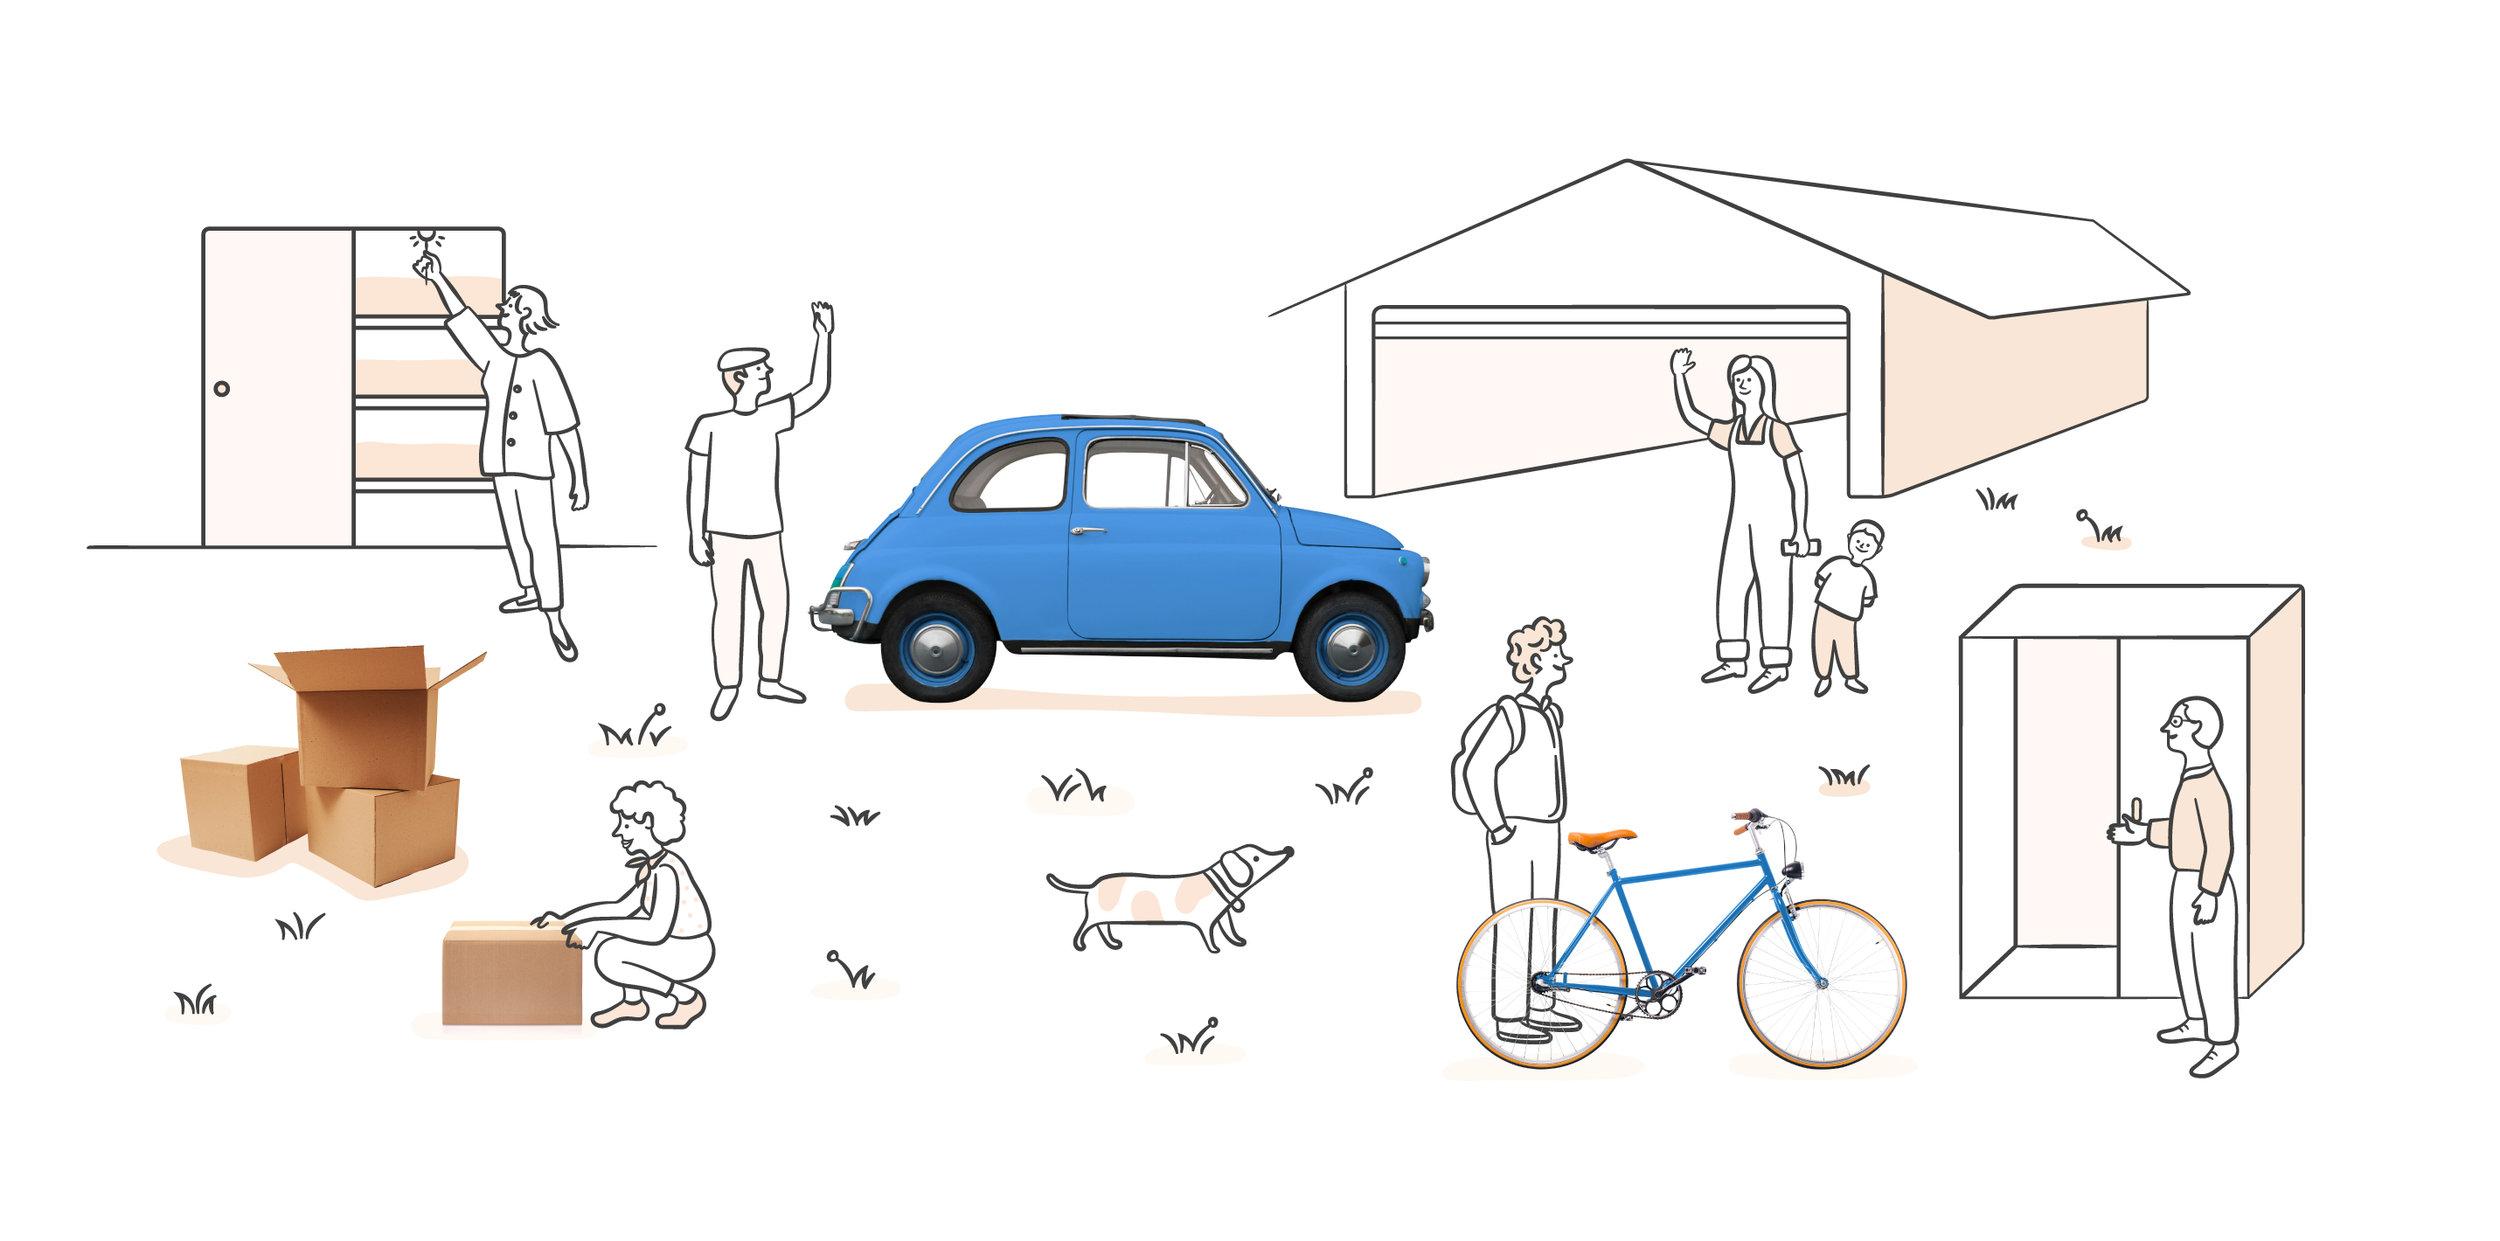 Illustration of neighbors waving to eachother